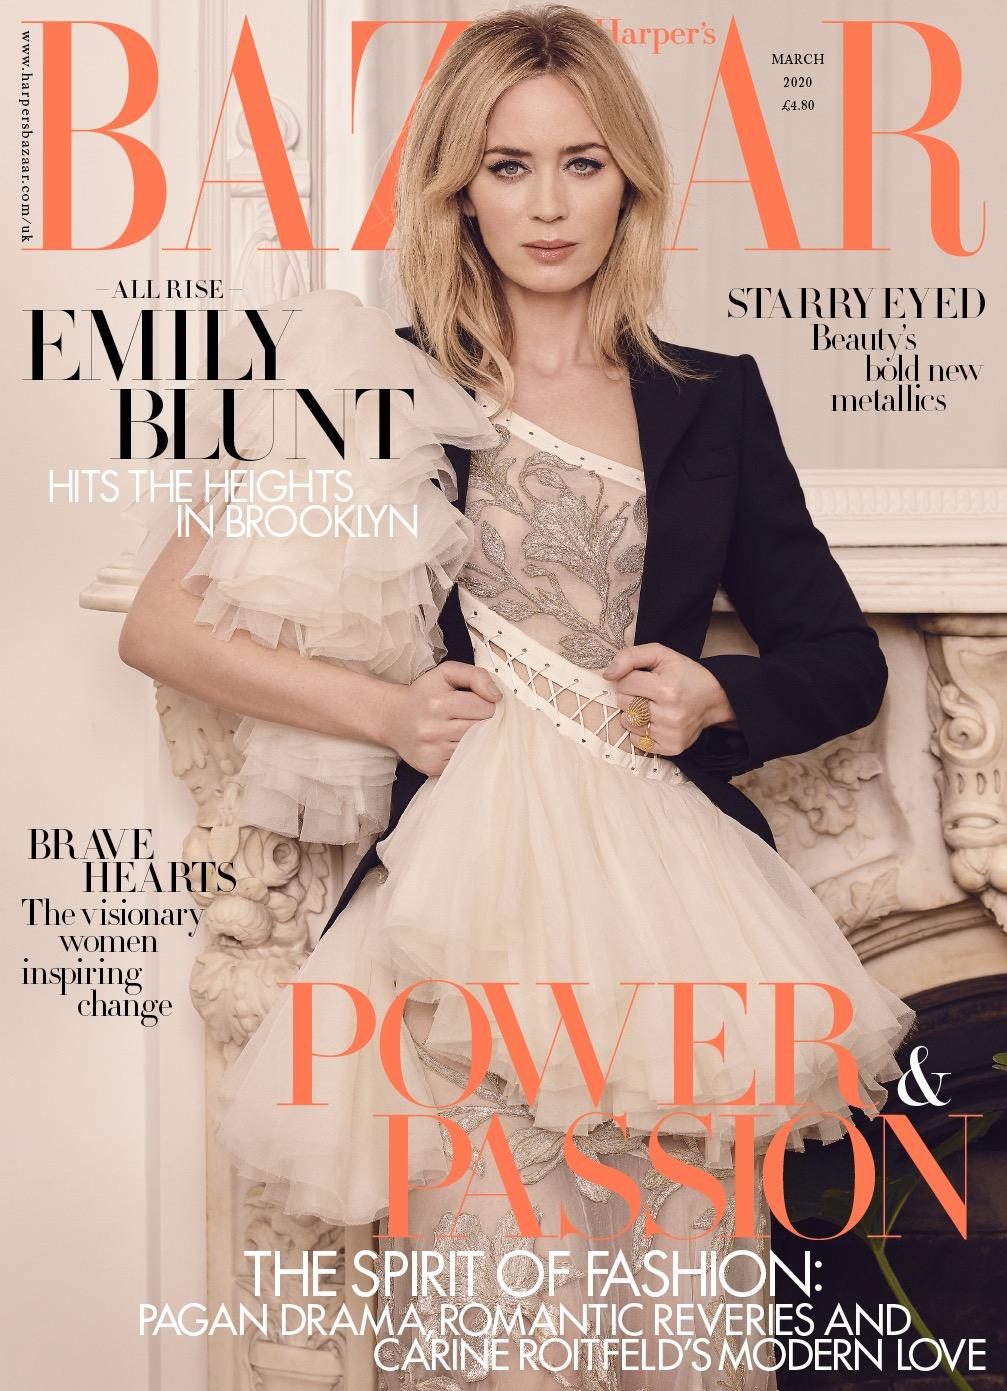 Harper's Bazaar U.K. March issue